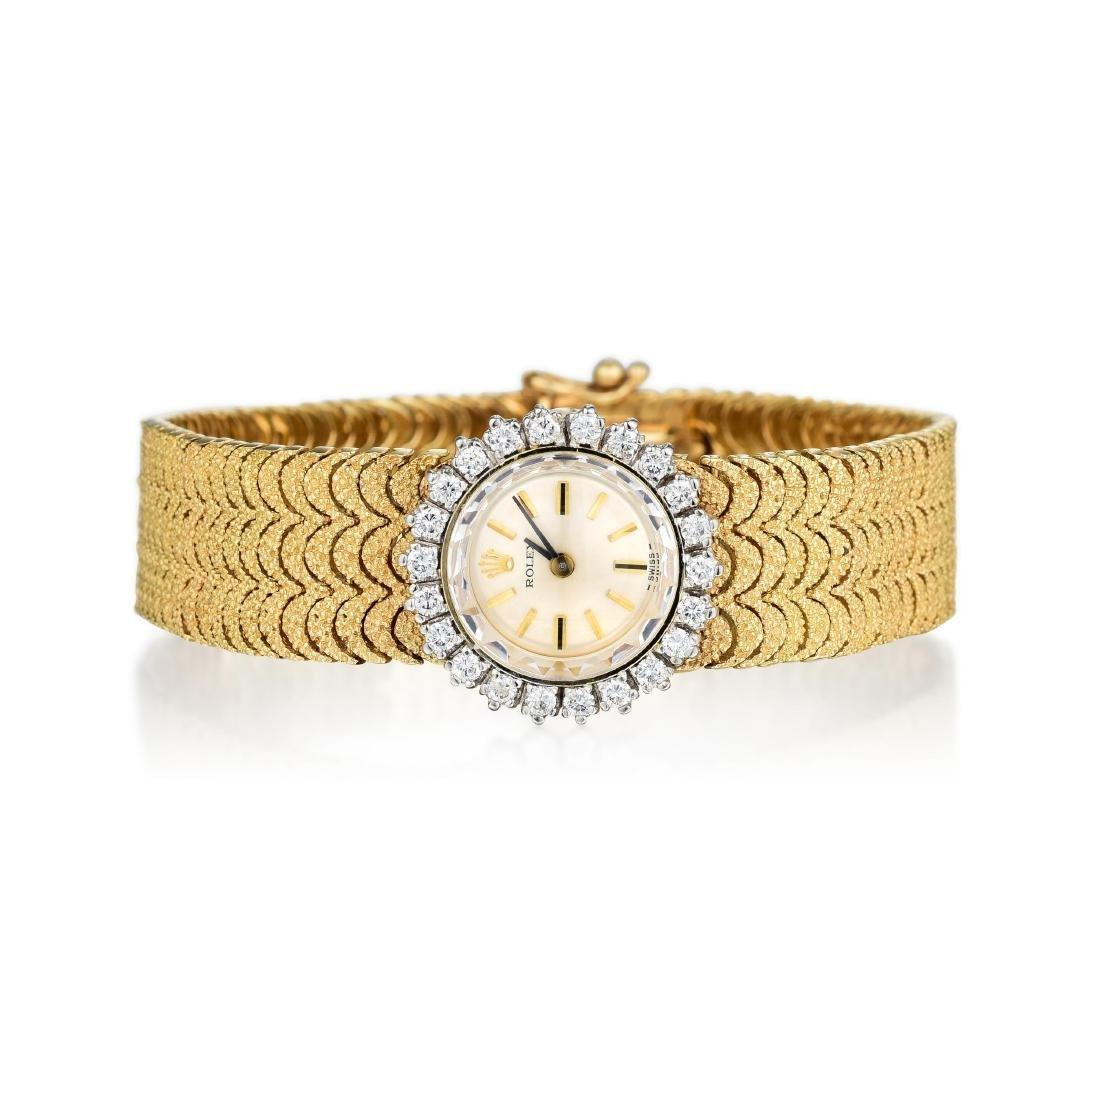 Rolex Ladies Diamond Dress Watch ref. 8159